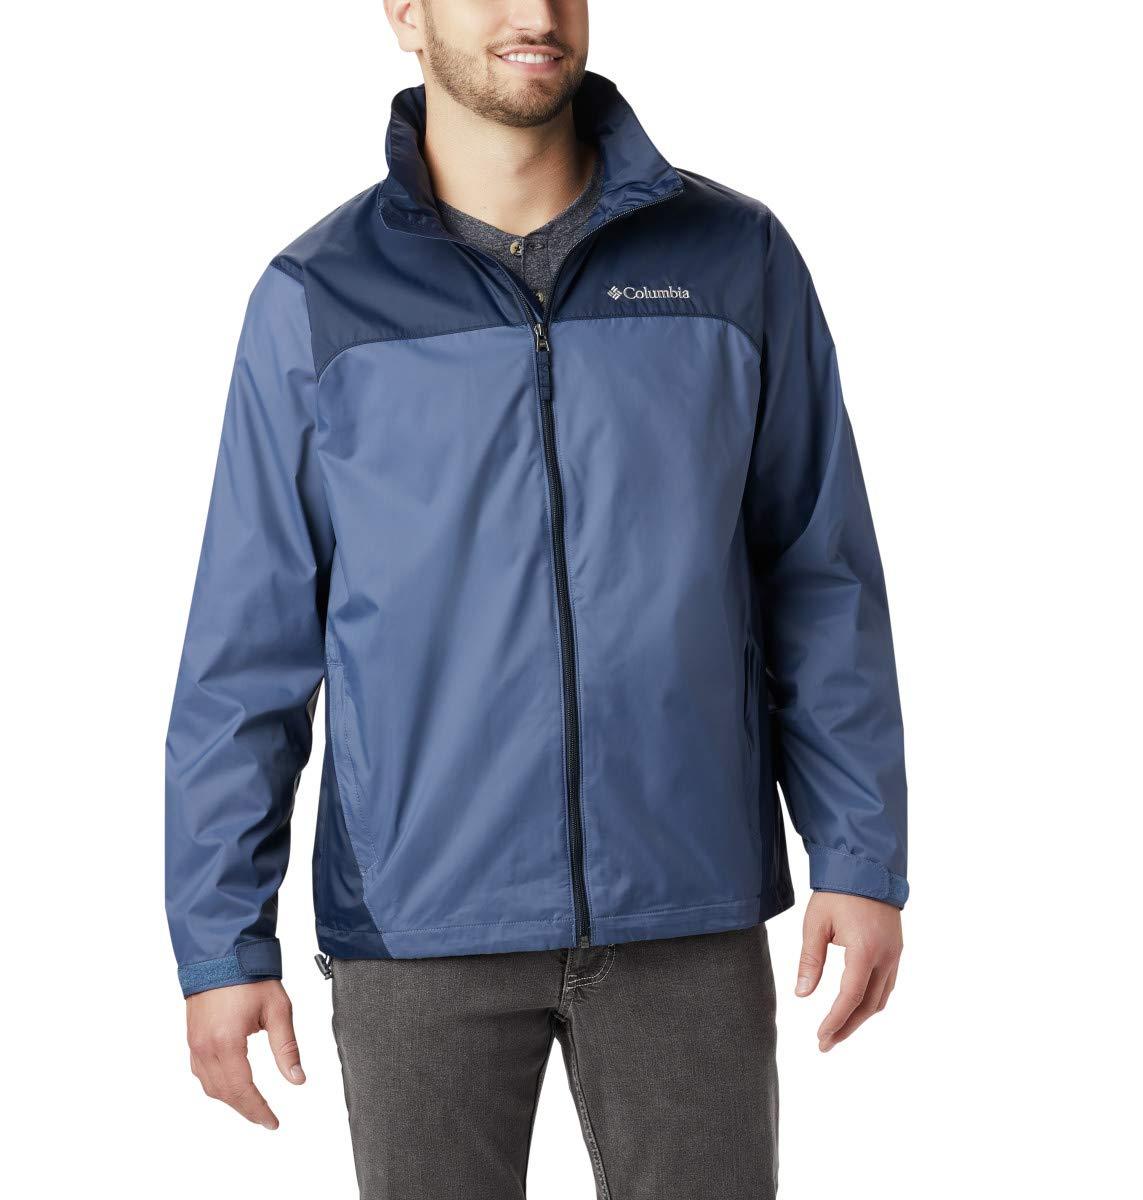 Columbia Men's Big and Tall Glennaker Lake Rain Jacket, Dark Mountain/Collegiate Navy, 5X by Columbia